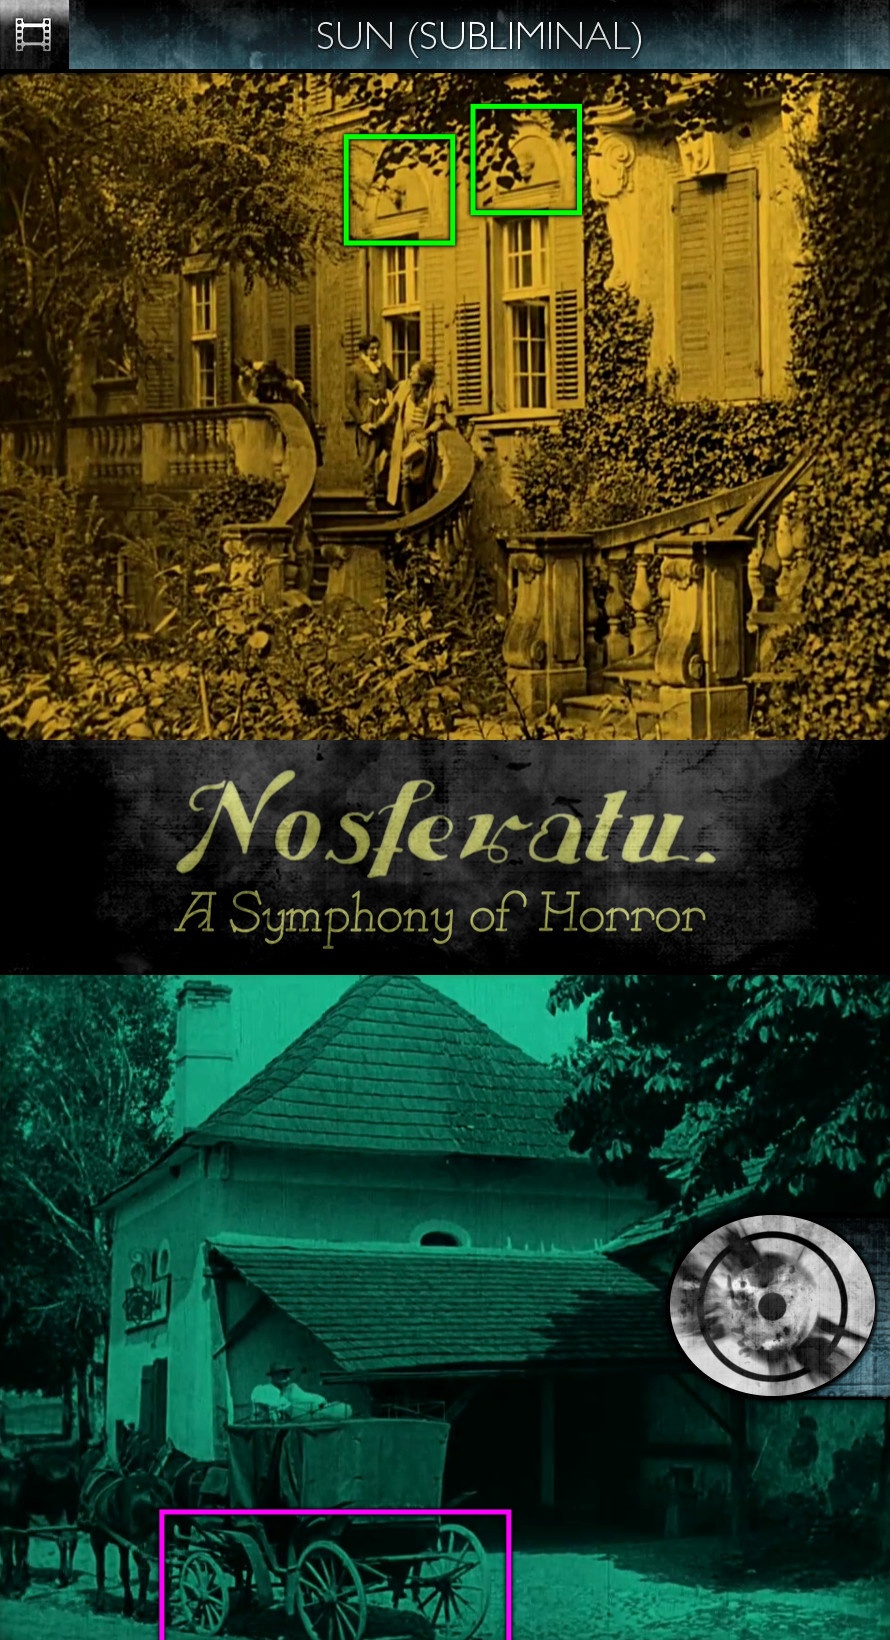 Nosferatu - A Symphony of Horror (1922) - Sun-Solar- Subliminal